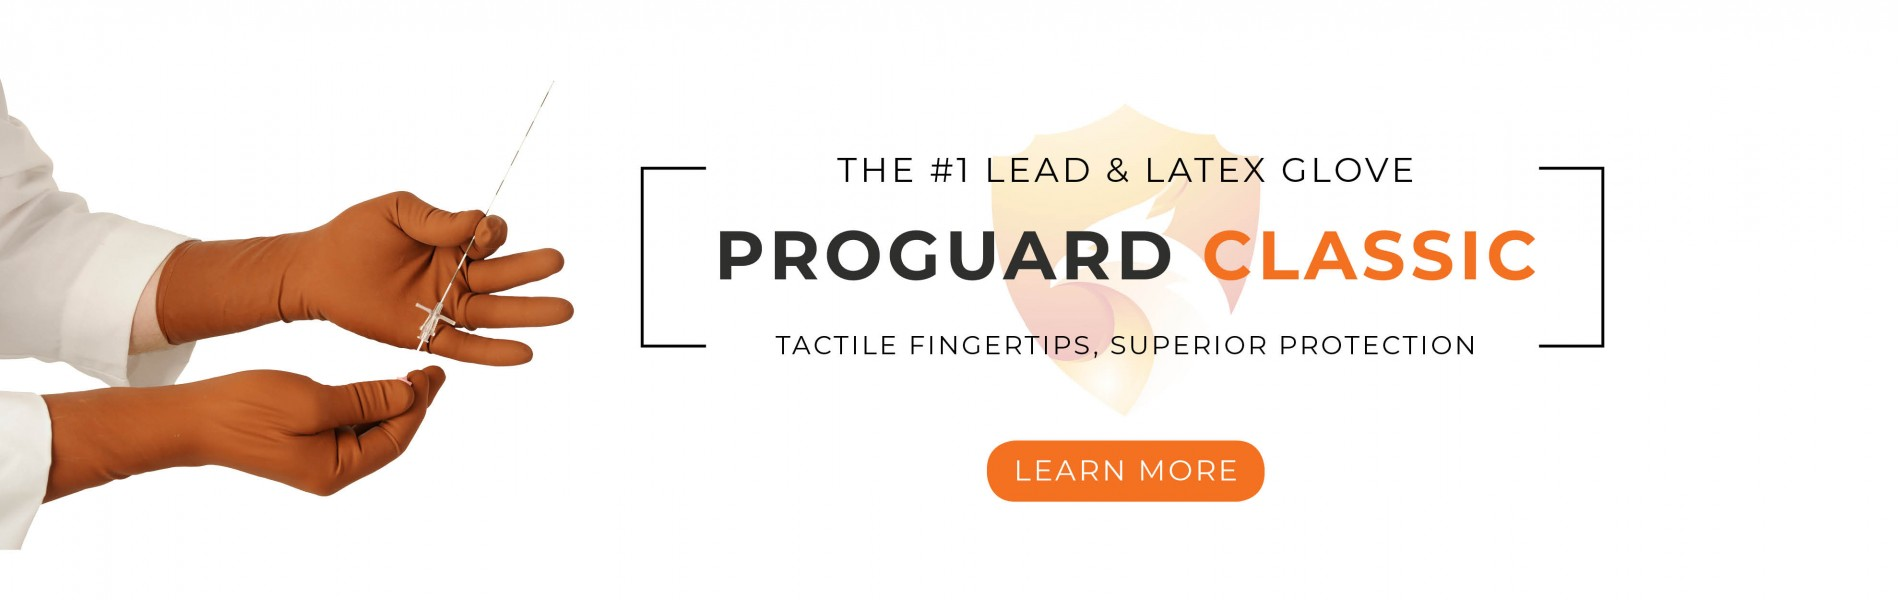 Proguard Classic_2019 main banner-1900x600.jpg